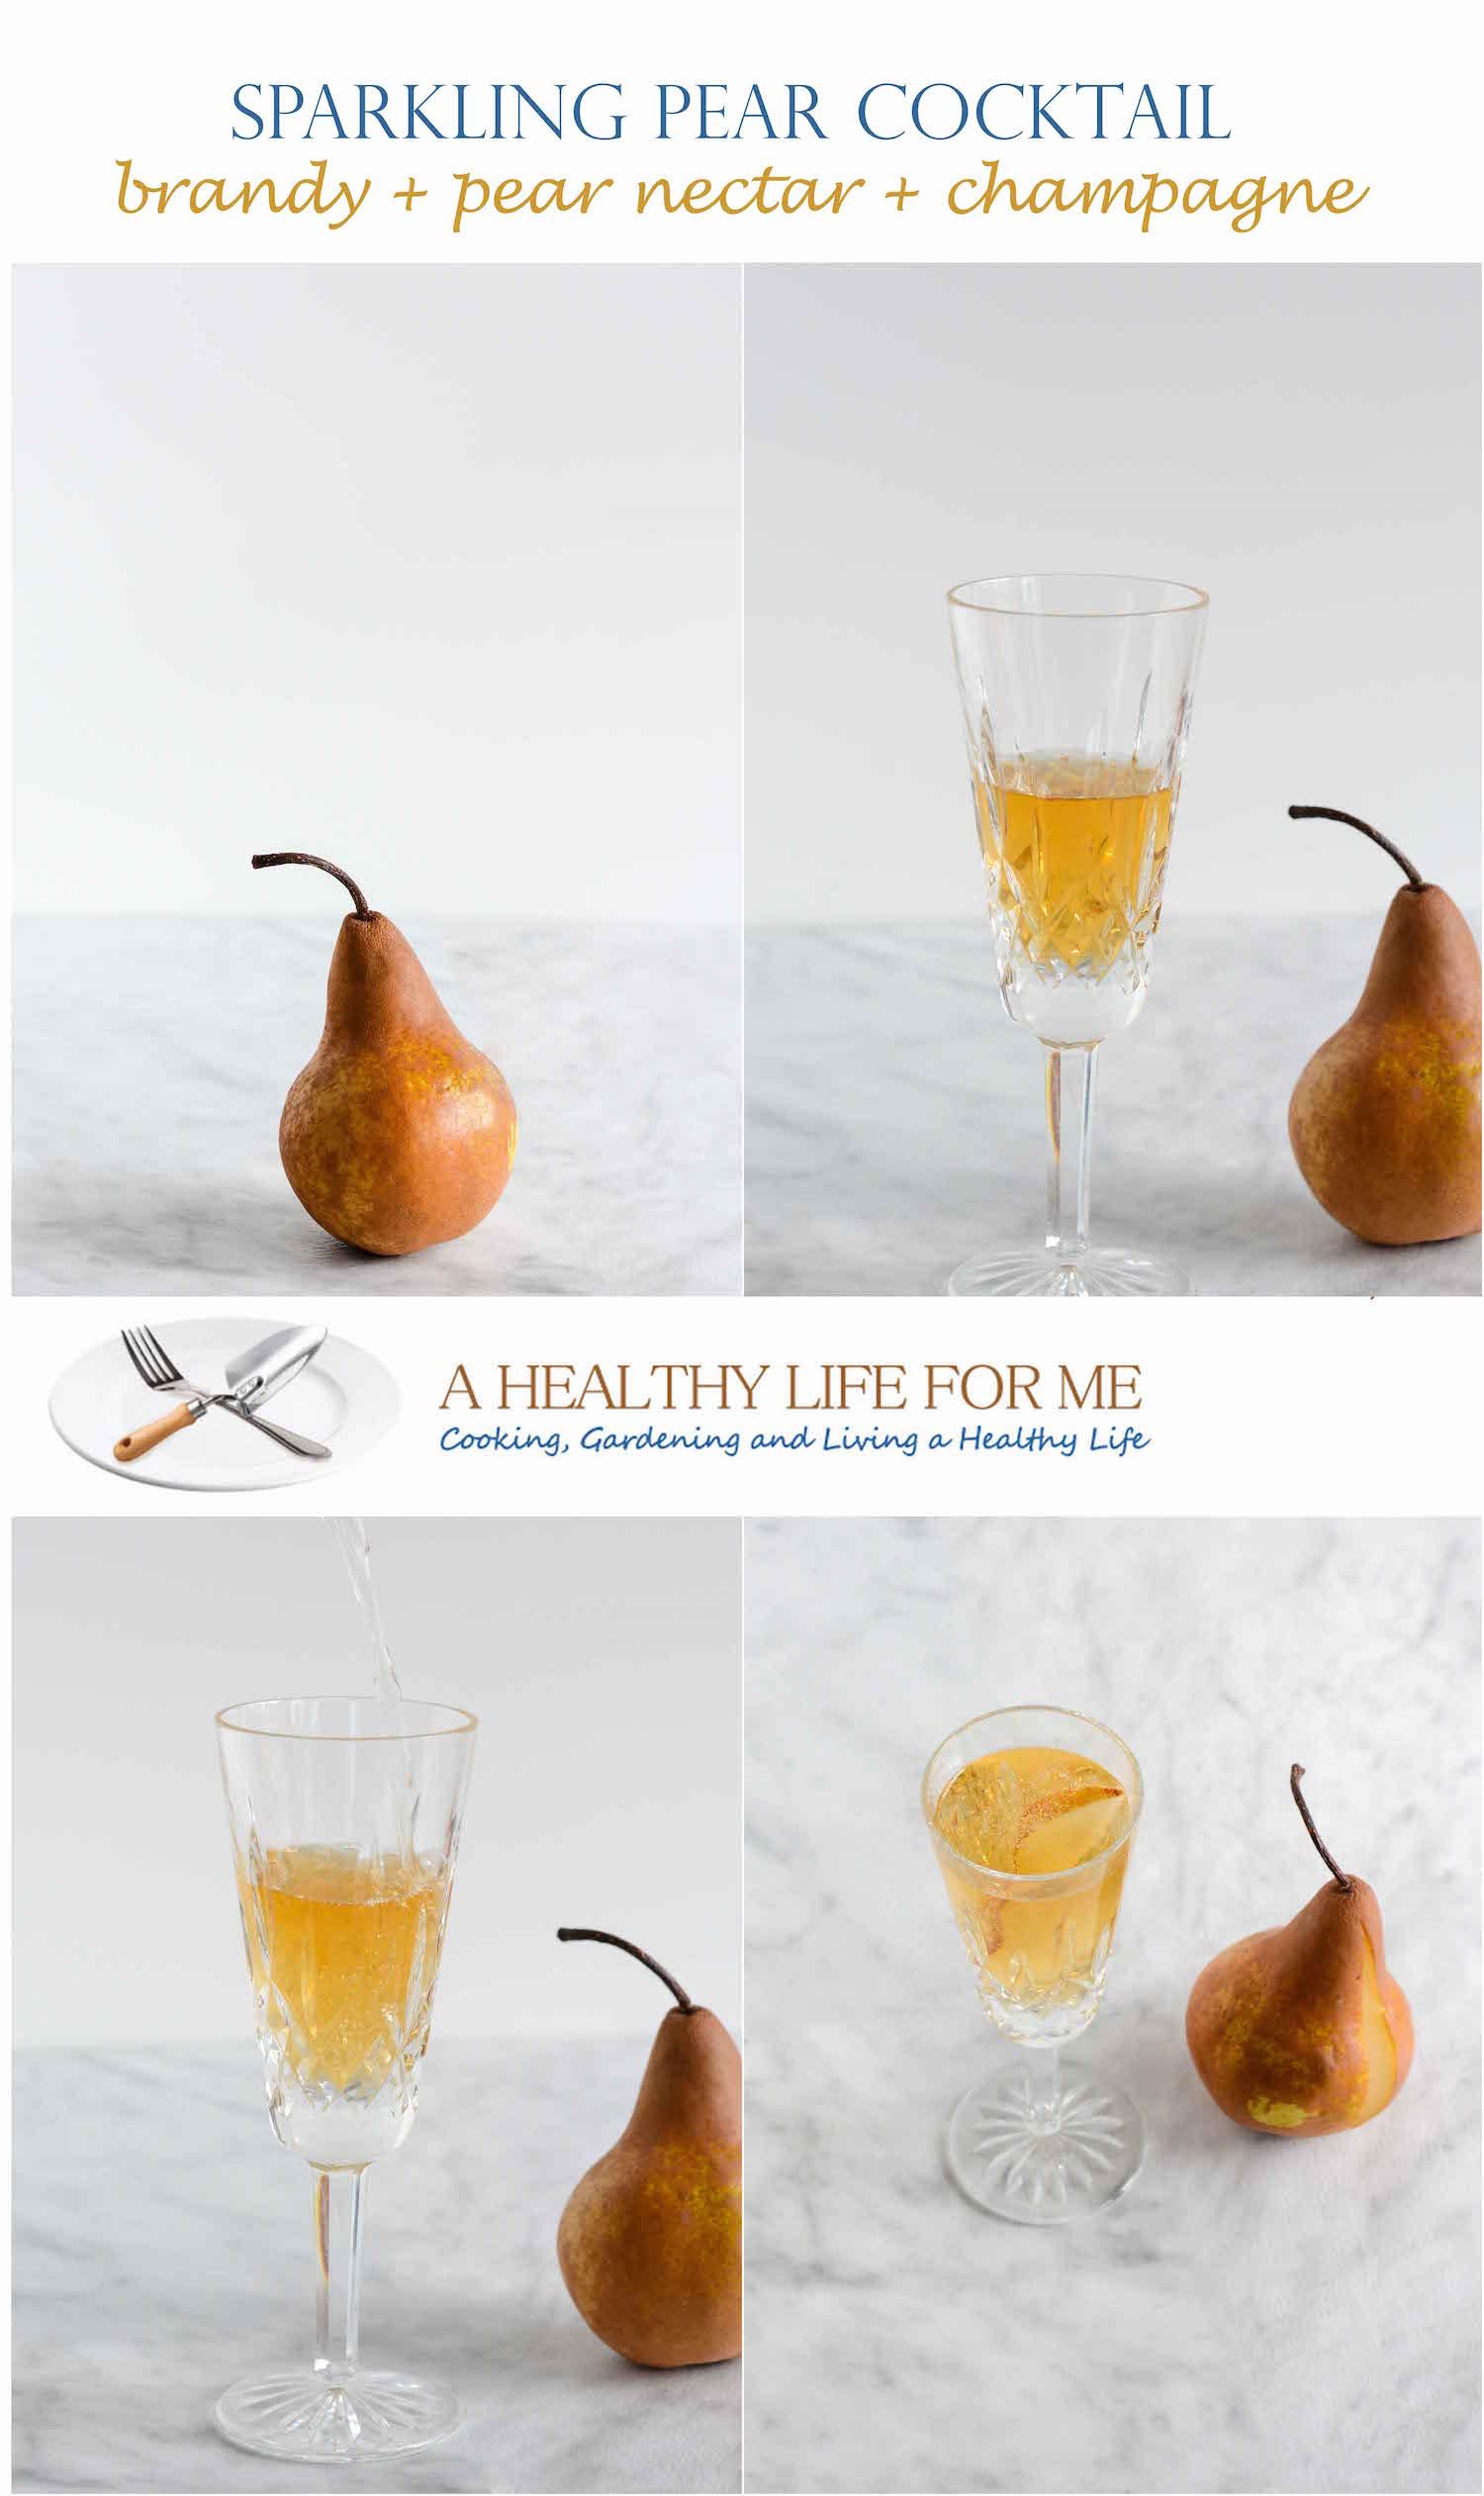 Sparkling Pear Cocktail Recipe | ahealthylifeforme.com